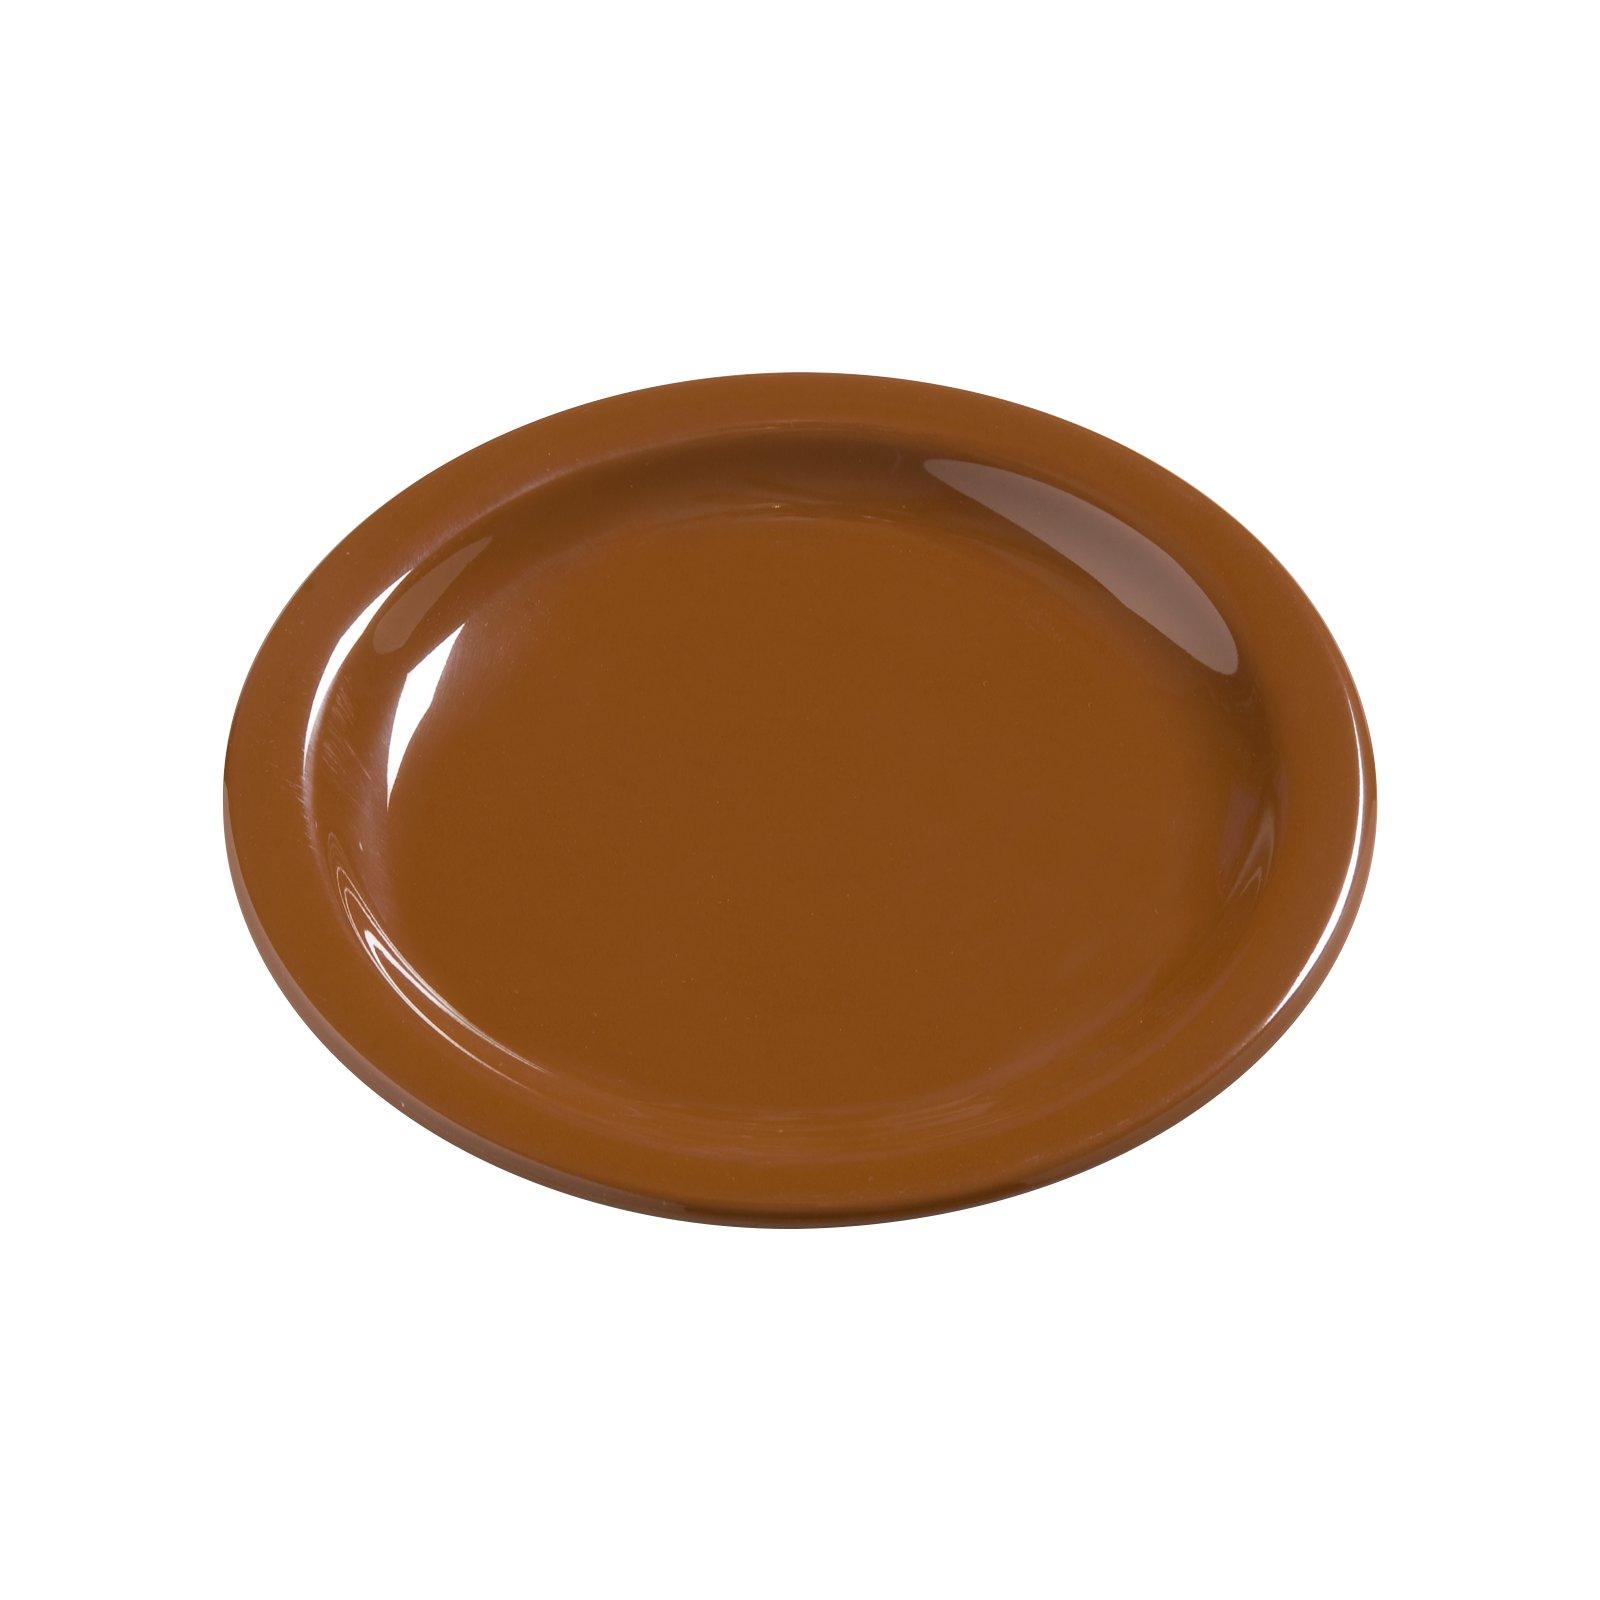 4385443 - Dayton™ Melamine Salad Plate 7.25  - Toffee  sc 1 st  Carlisle FoodService Products & 4385443 - Dayton™ Melamine Salad Plate 7.25